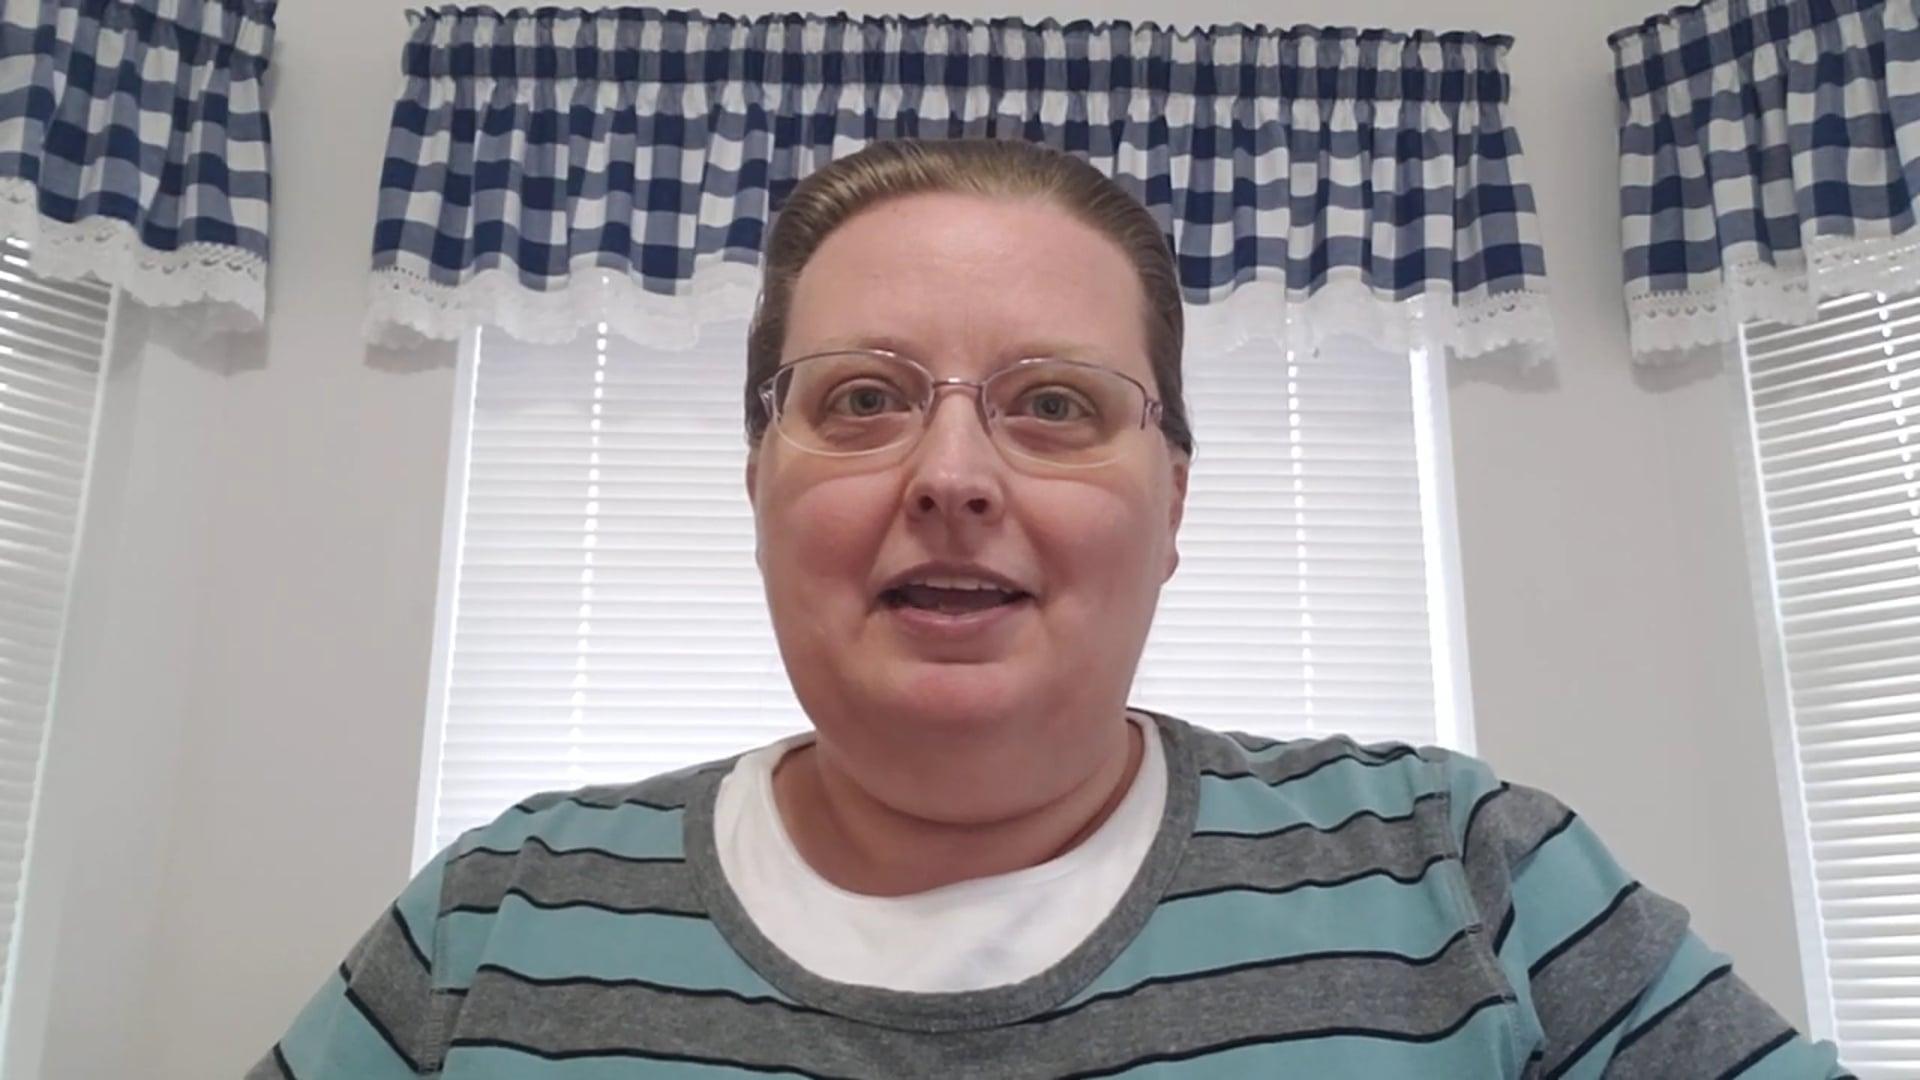 Online Homeschool Science Classes Video Review - Greg Landry